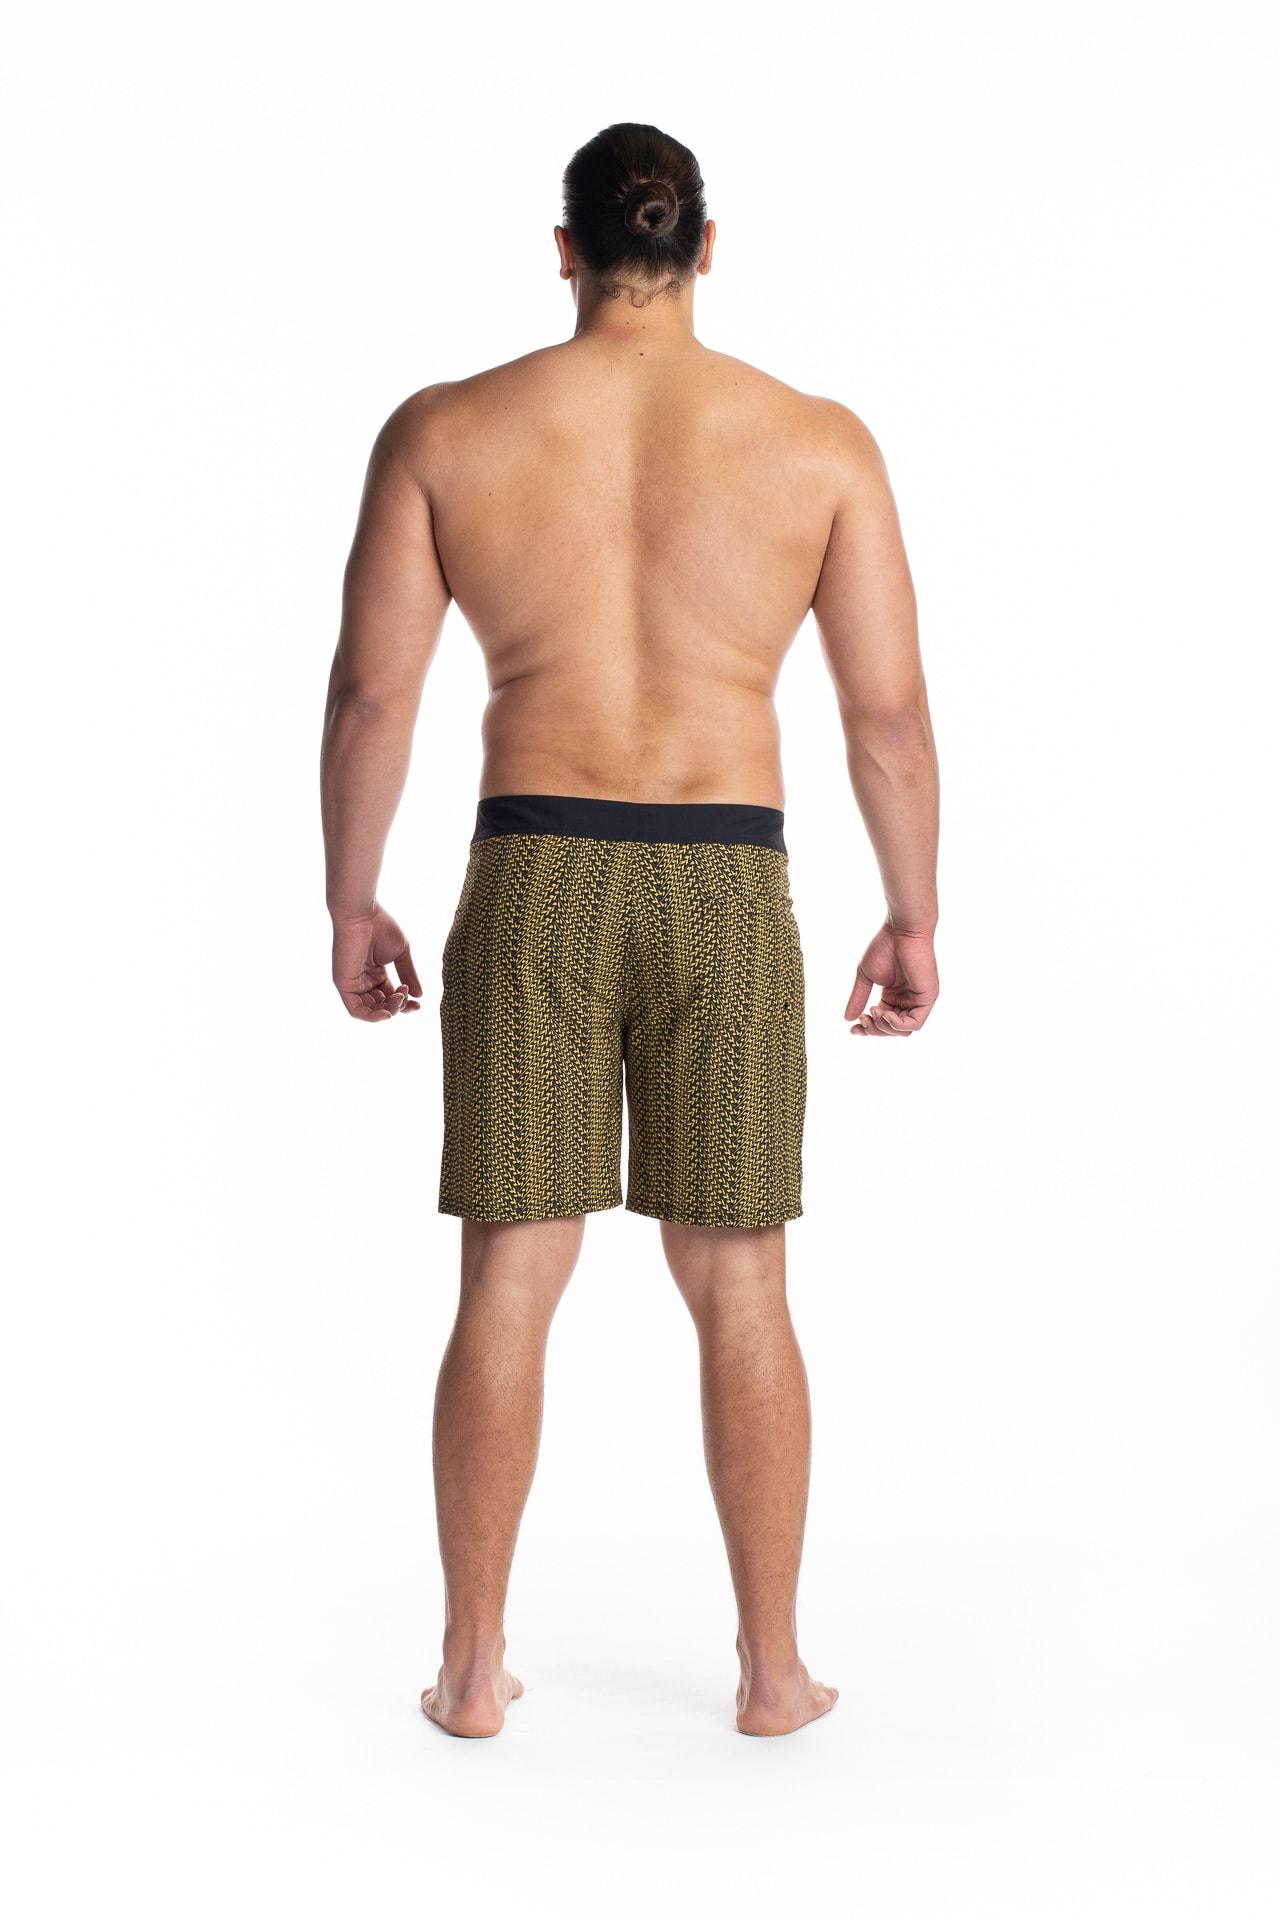 Male model wearing 4-way Stretch in Black Yellow Niau - Back View